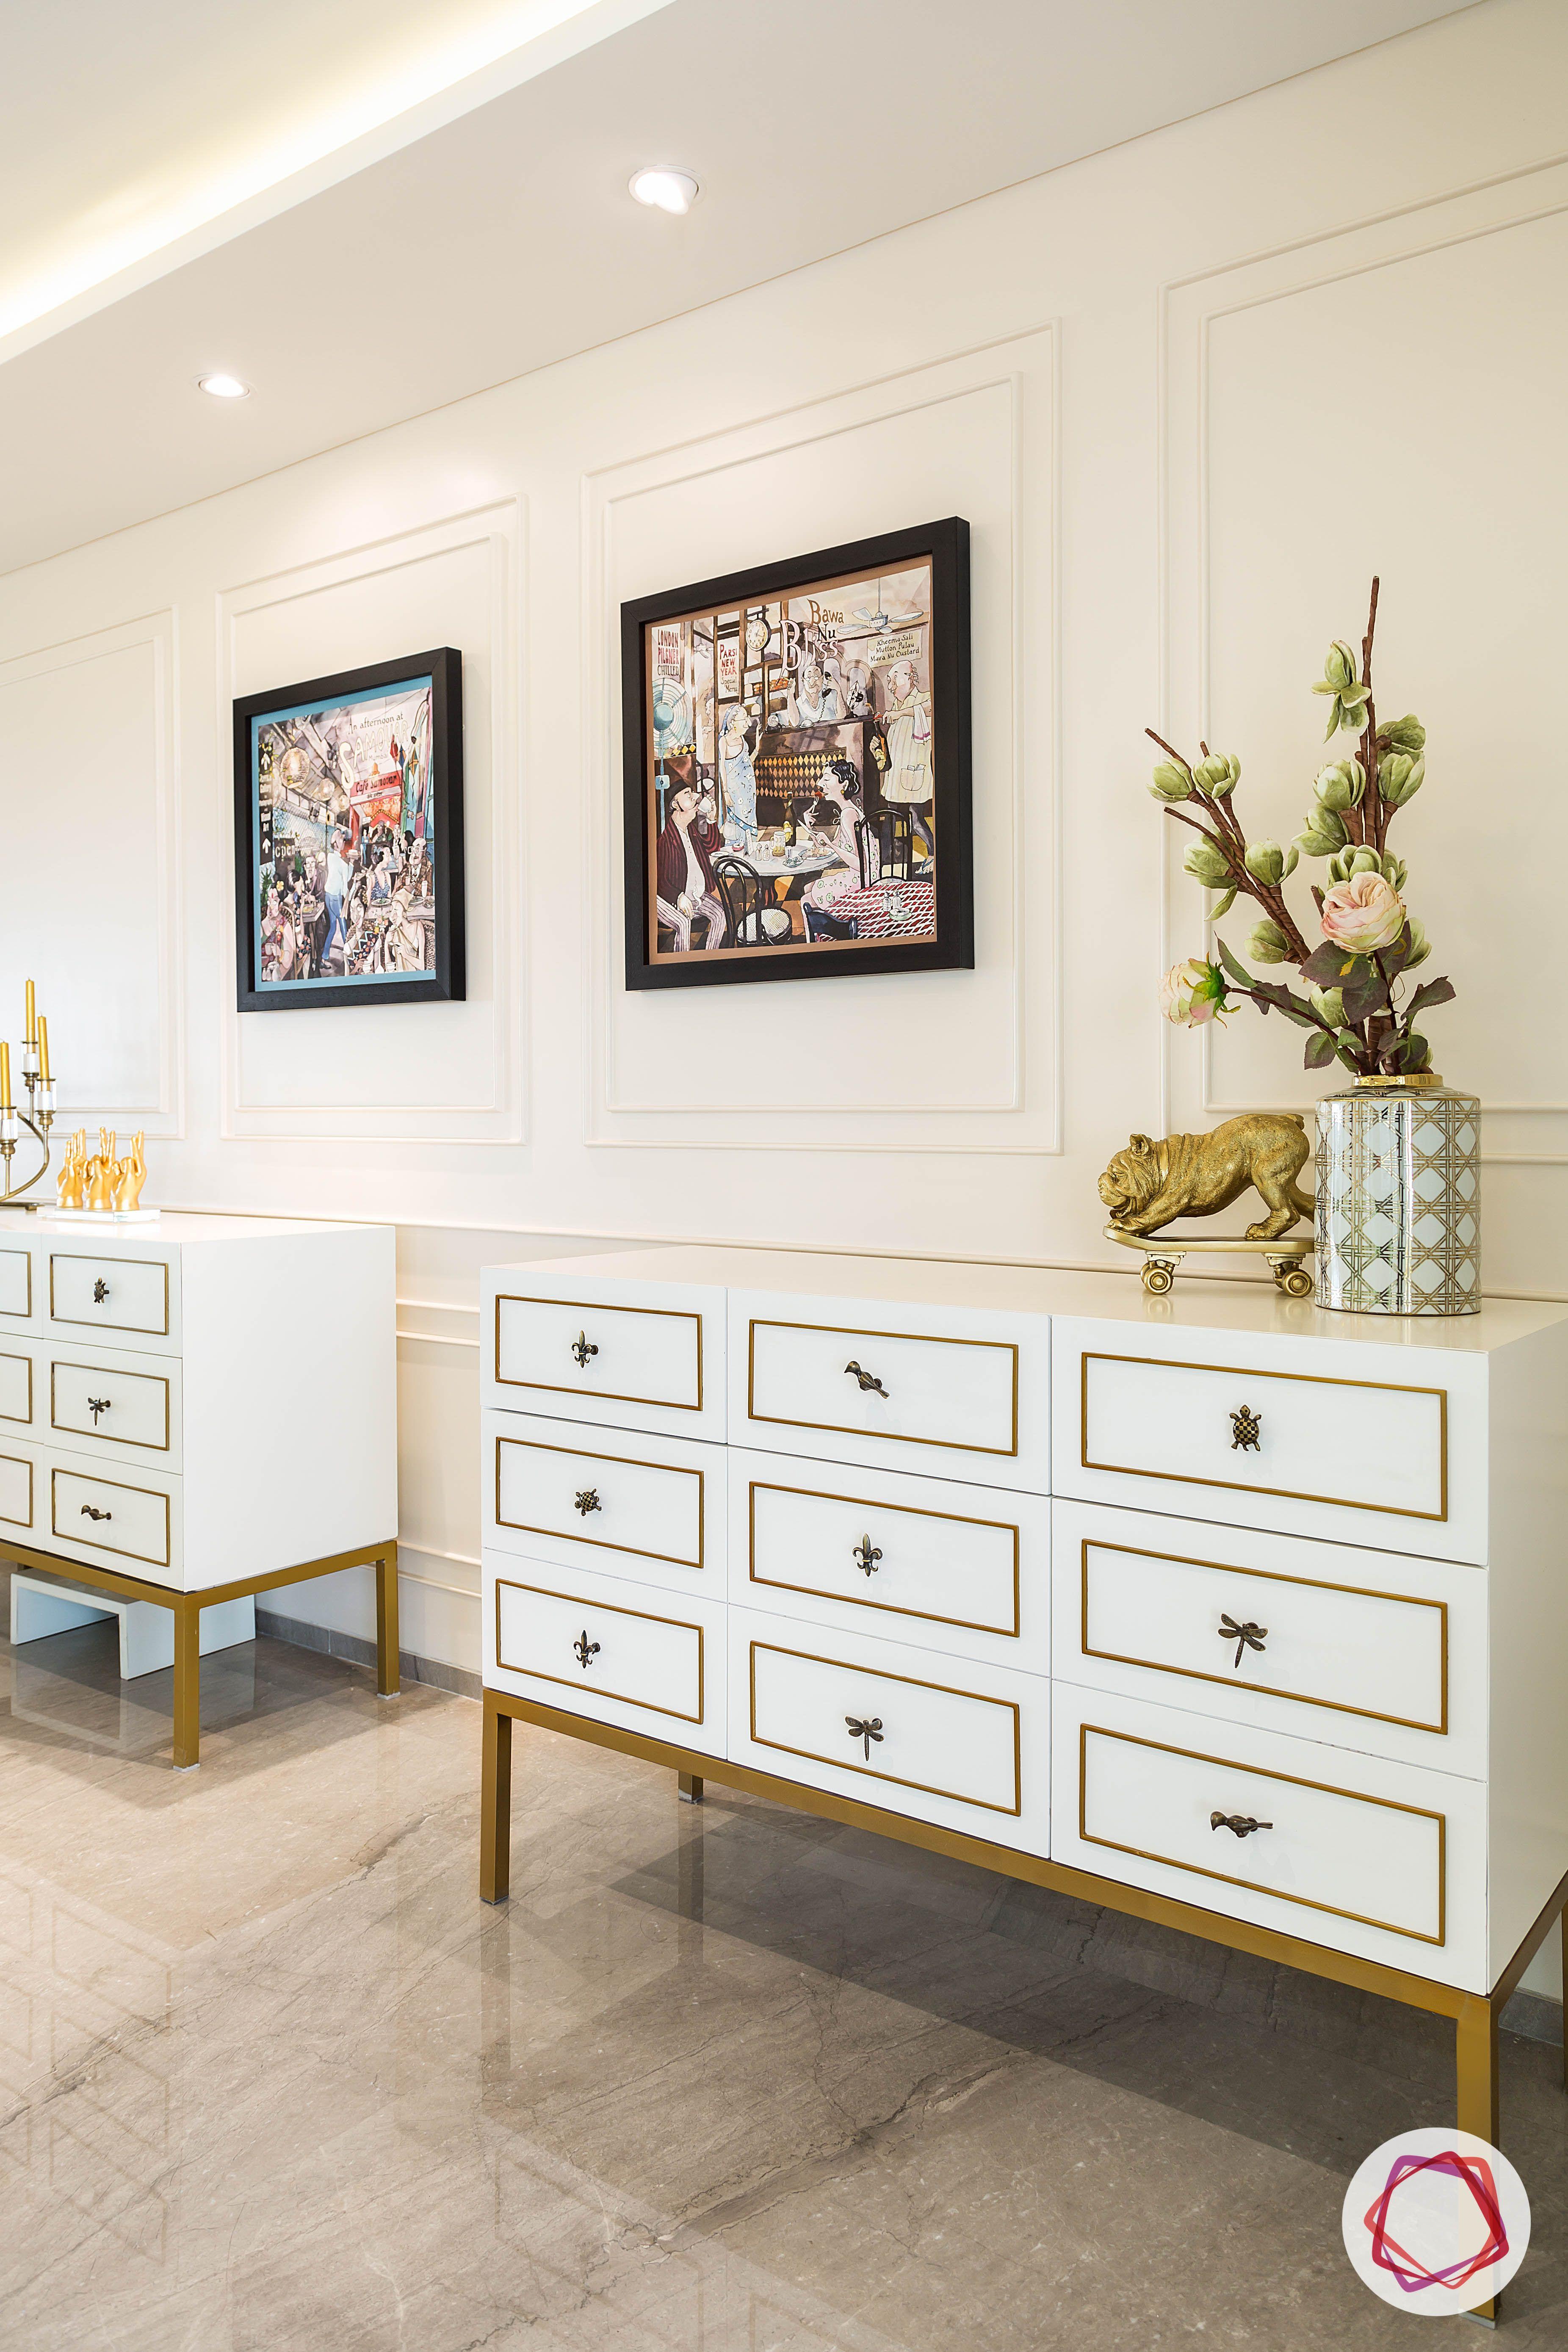 condo-interior-design-white-crockery-unit-designs-brass-trim designs